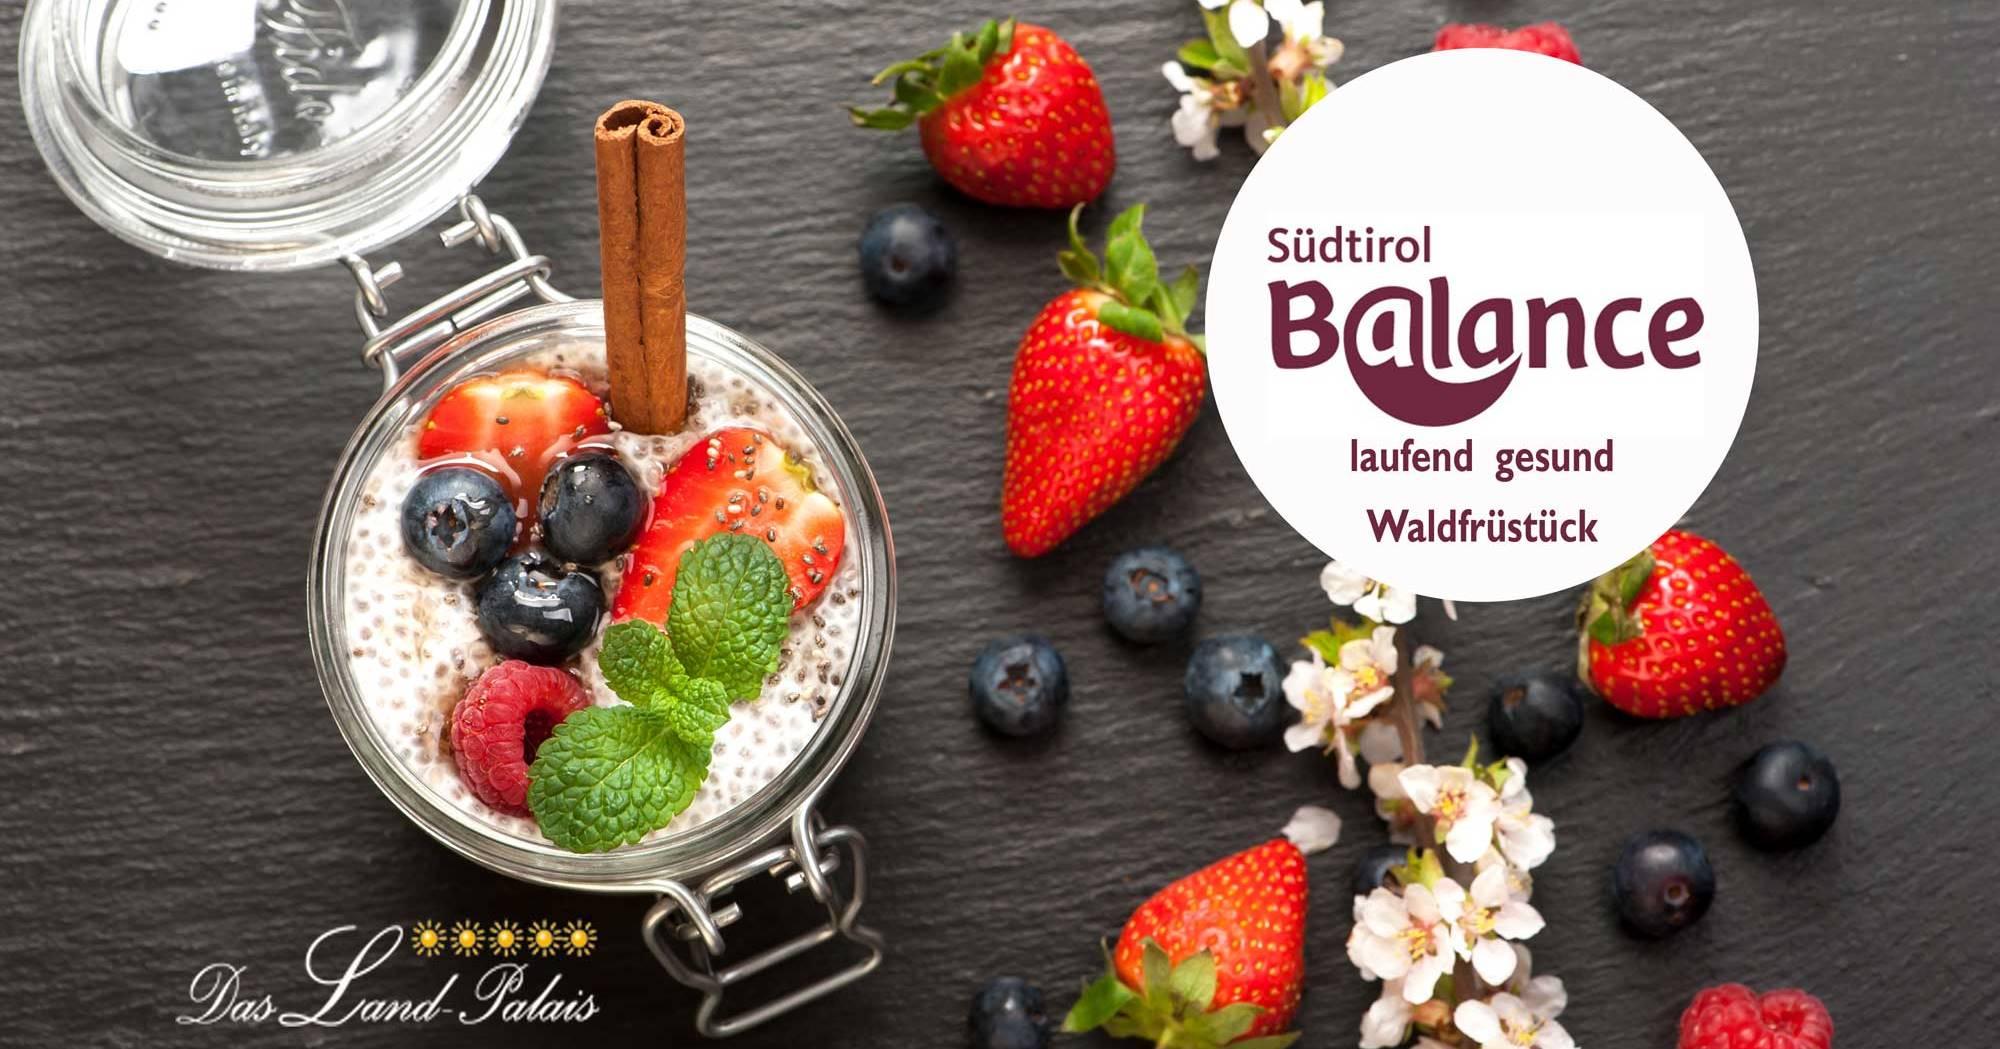 Südtirol Balance Waldfrühstück - laufend gesund